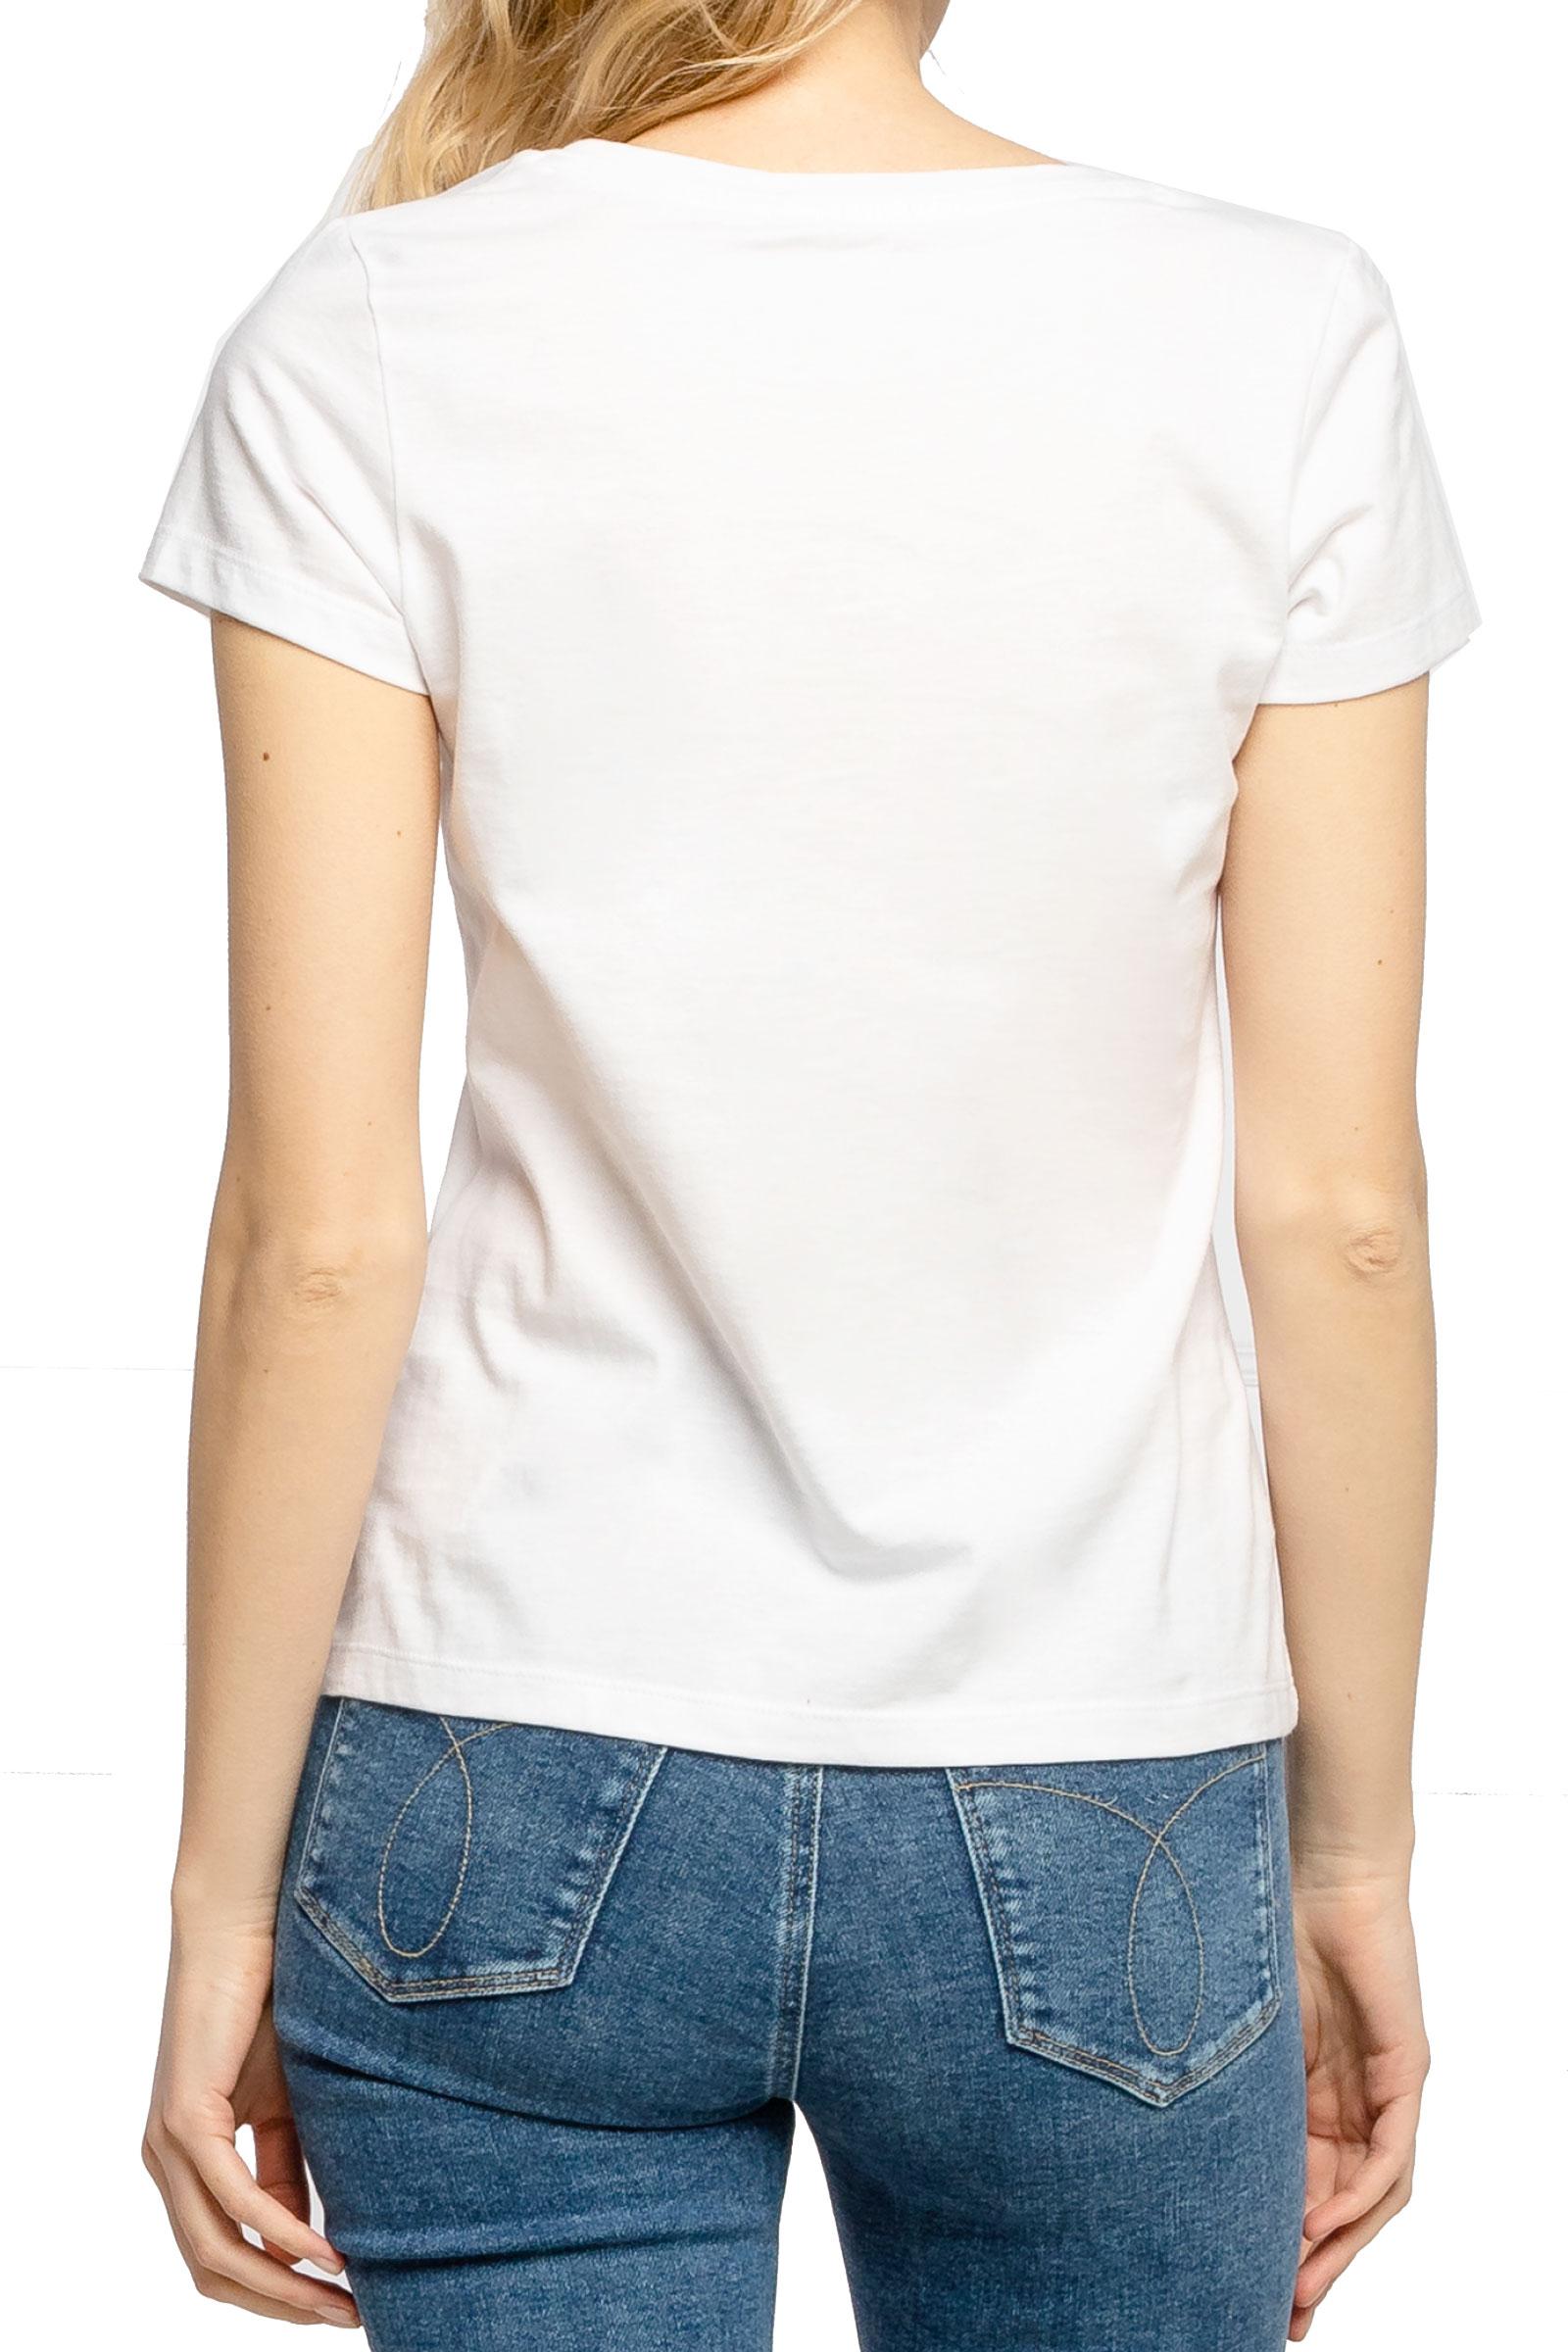 CALVIN KLEIN JEANS Women's T-Shirt CALVIN KLEIN JEANS | T-Shirt | J20J215704YAF